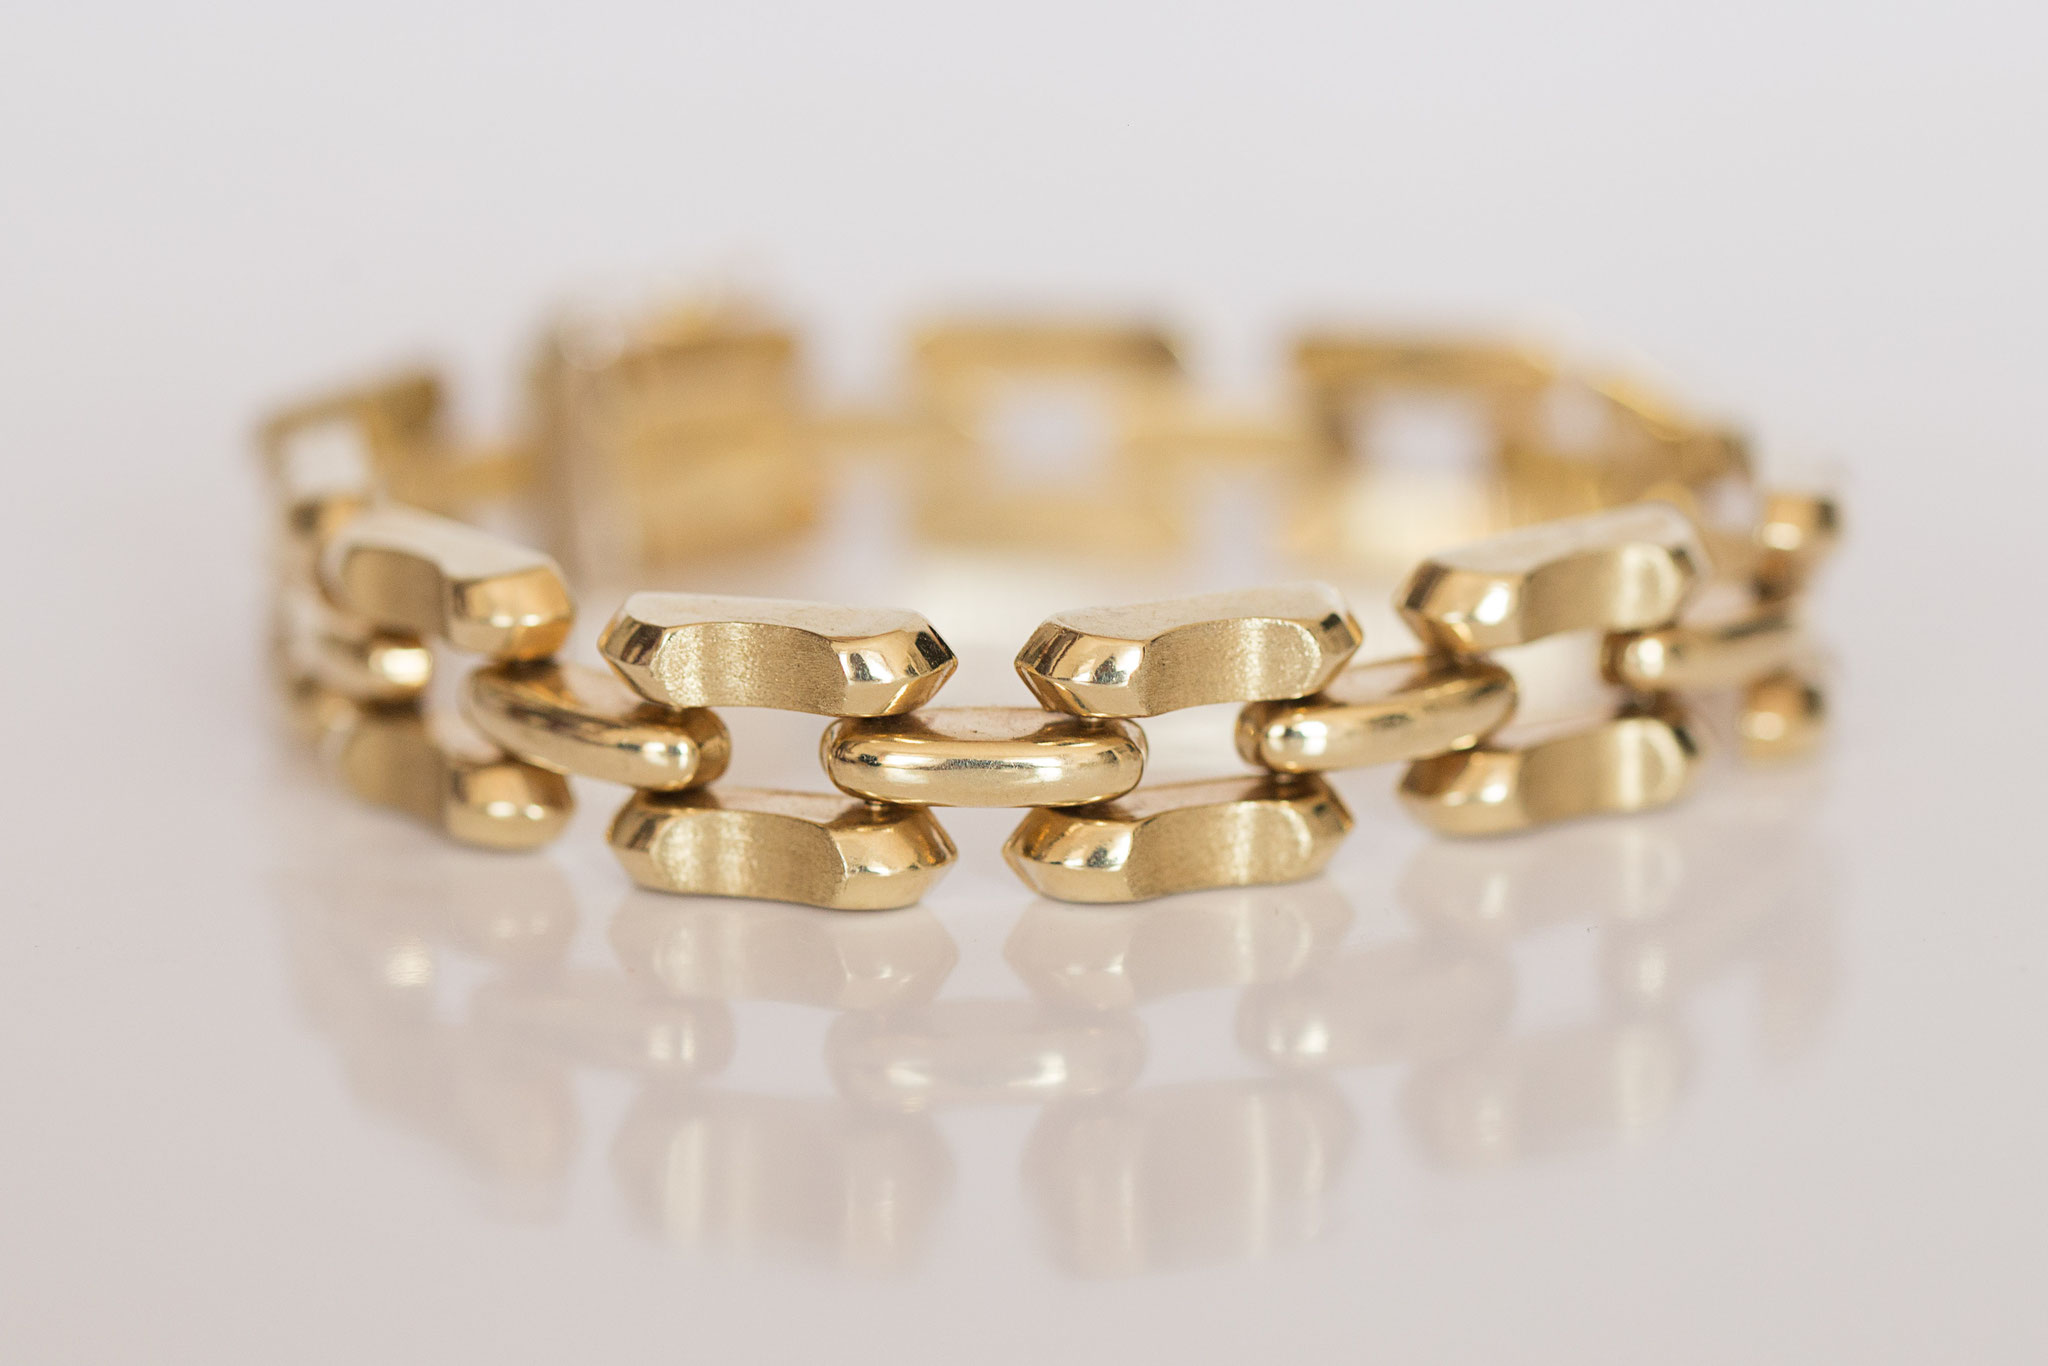 Vintage Goldarmband in 14 kt Gelbgold Art Deco Style